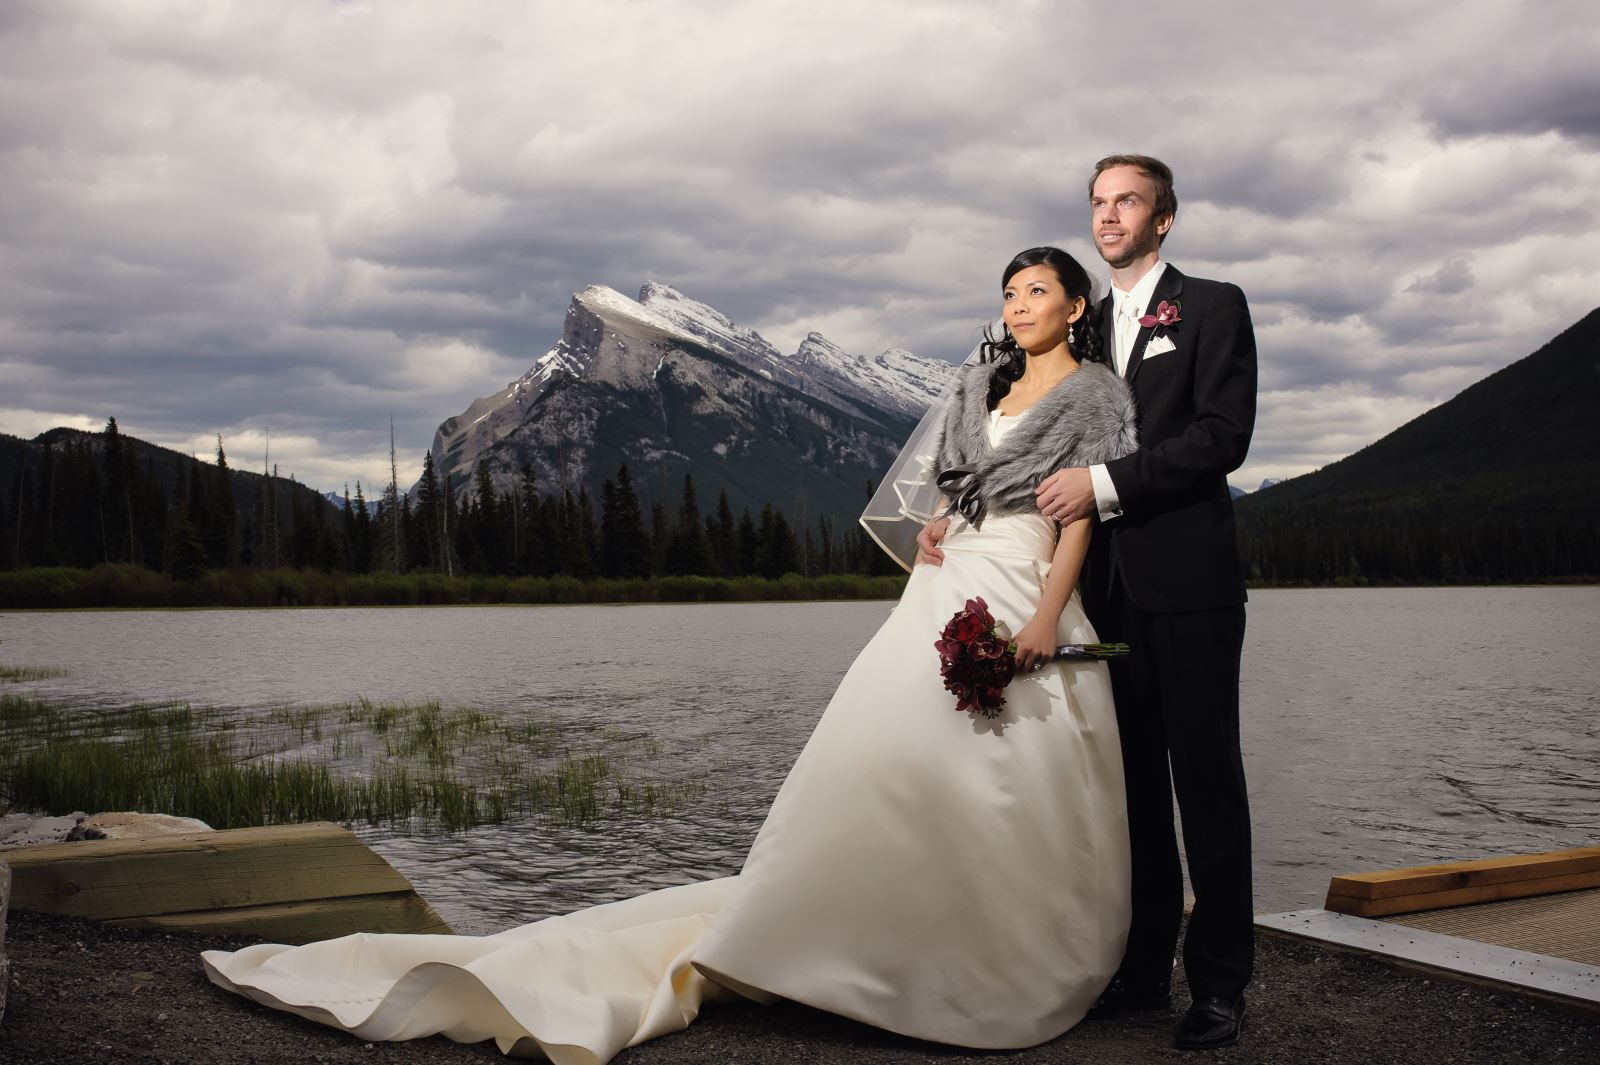 Esther's Wedding Dress Preservation in Alberta